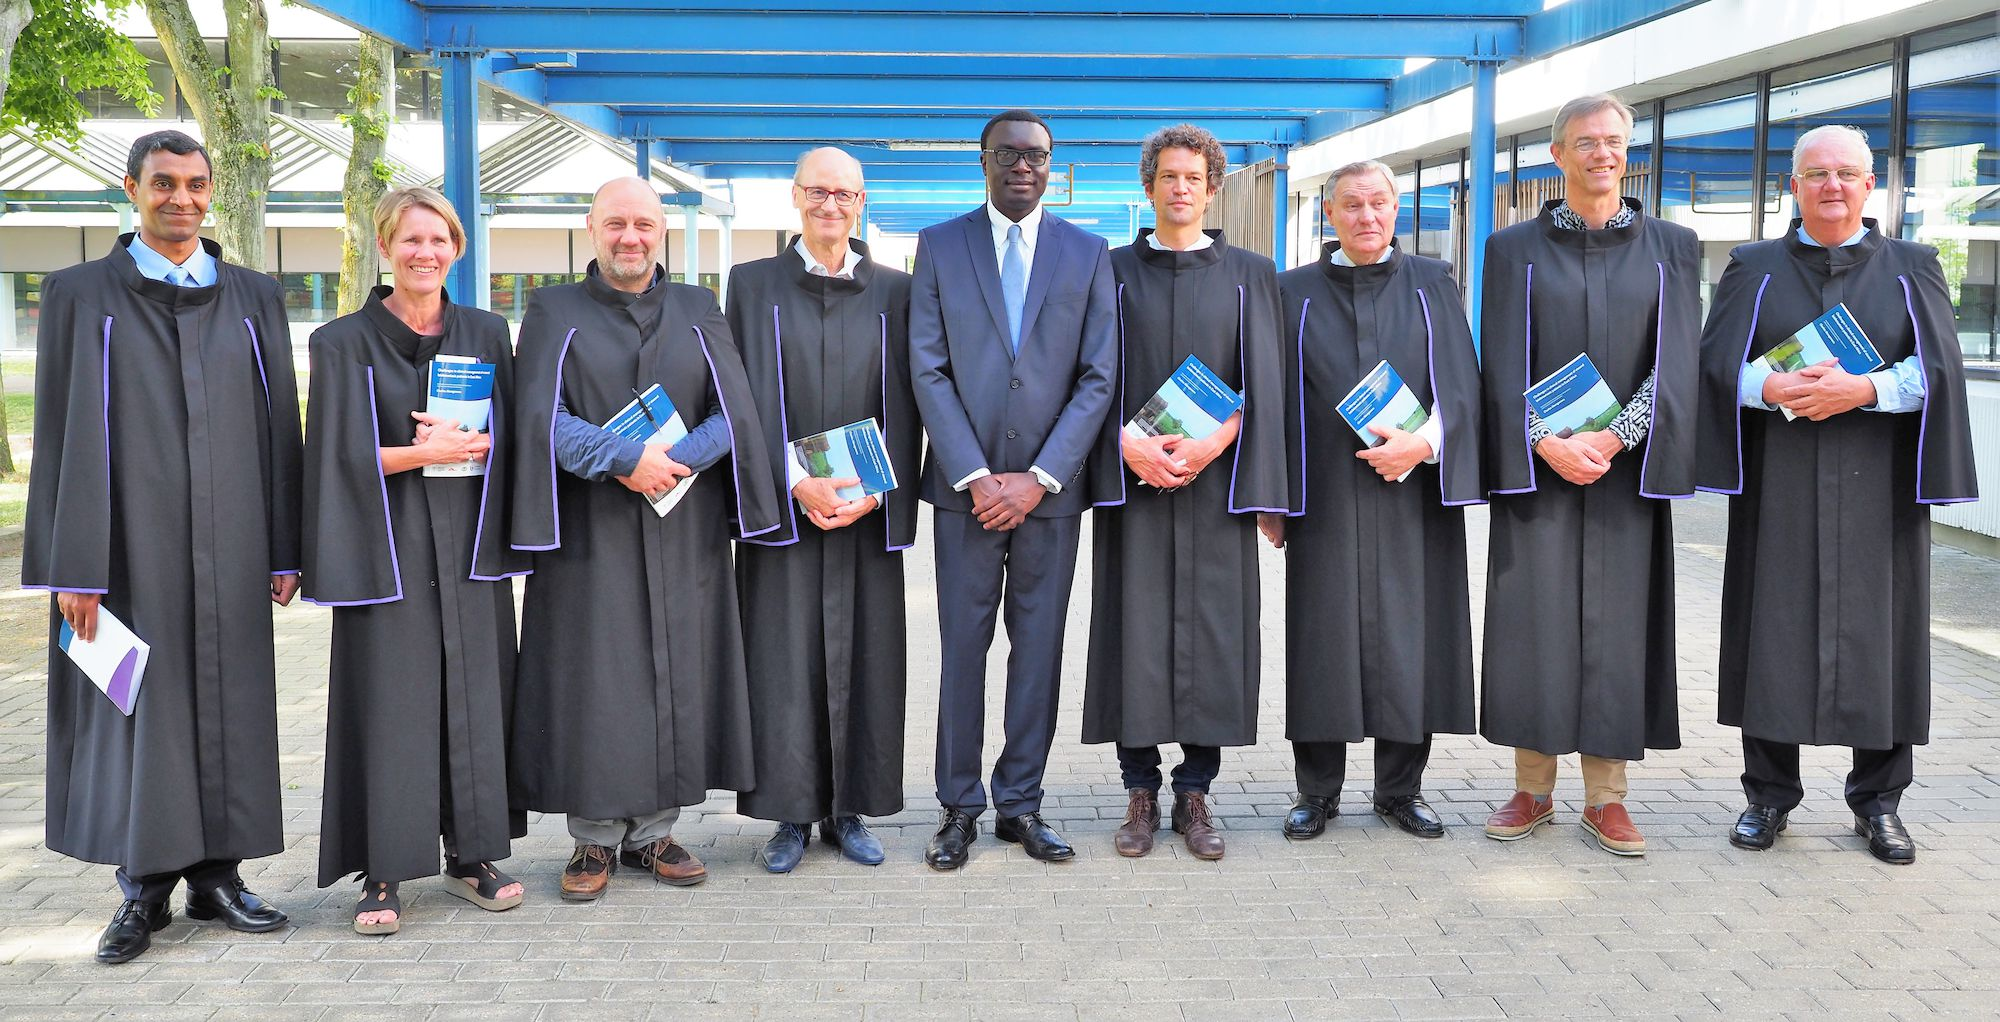 Doctoraatsverdediging Charles Abongomera - 30 mei 2018